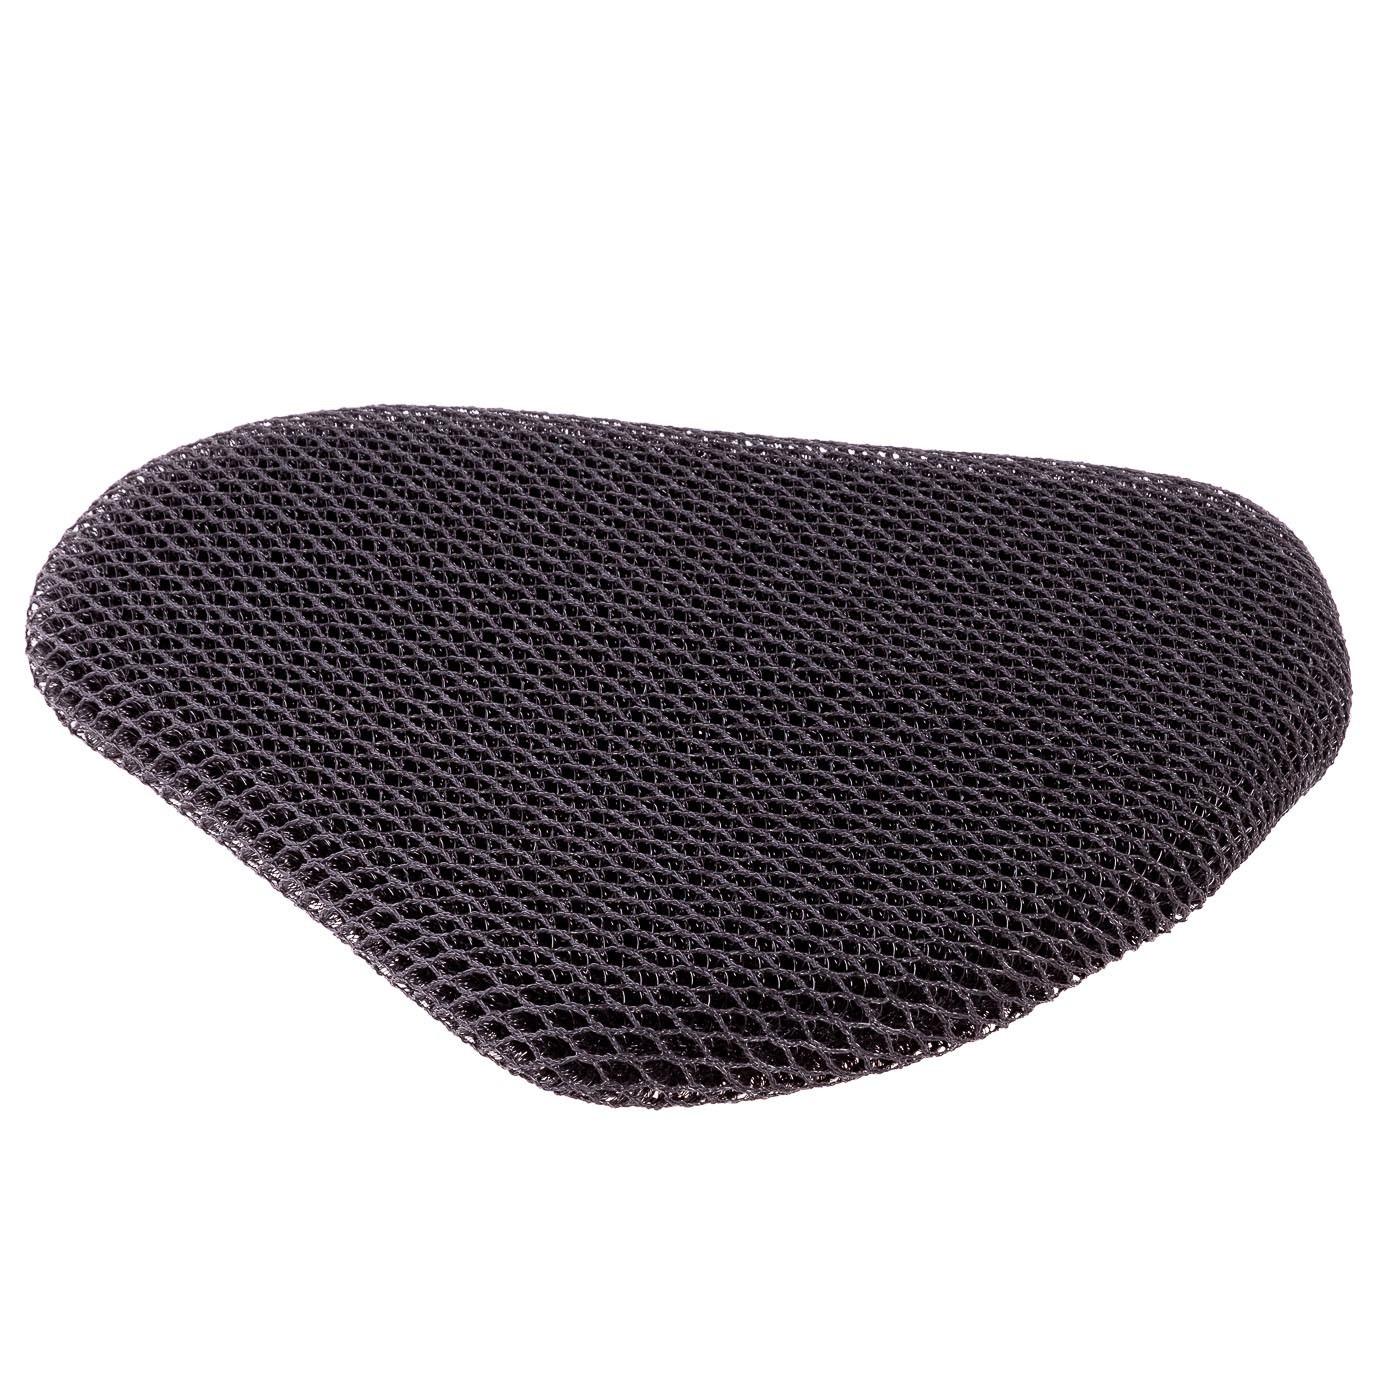 54×46/22 cm  Motorbike seat pad (XL)